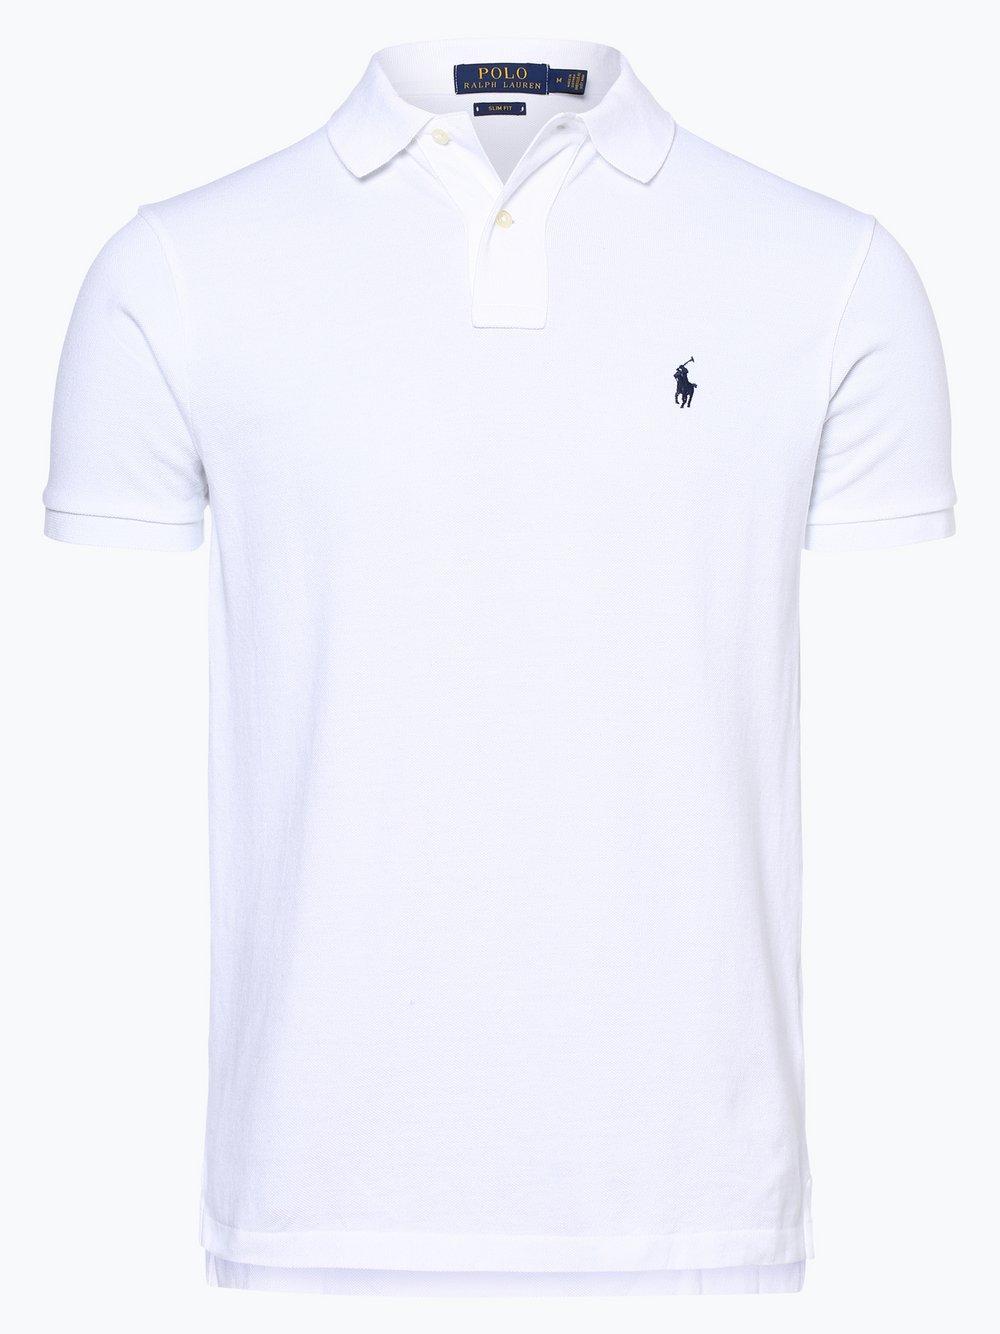 6b2beb6f420450 Polo Ralph Lauren Herren Poloshirt - Slim Fit online kaufen ...